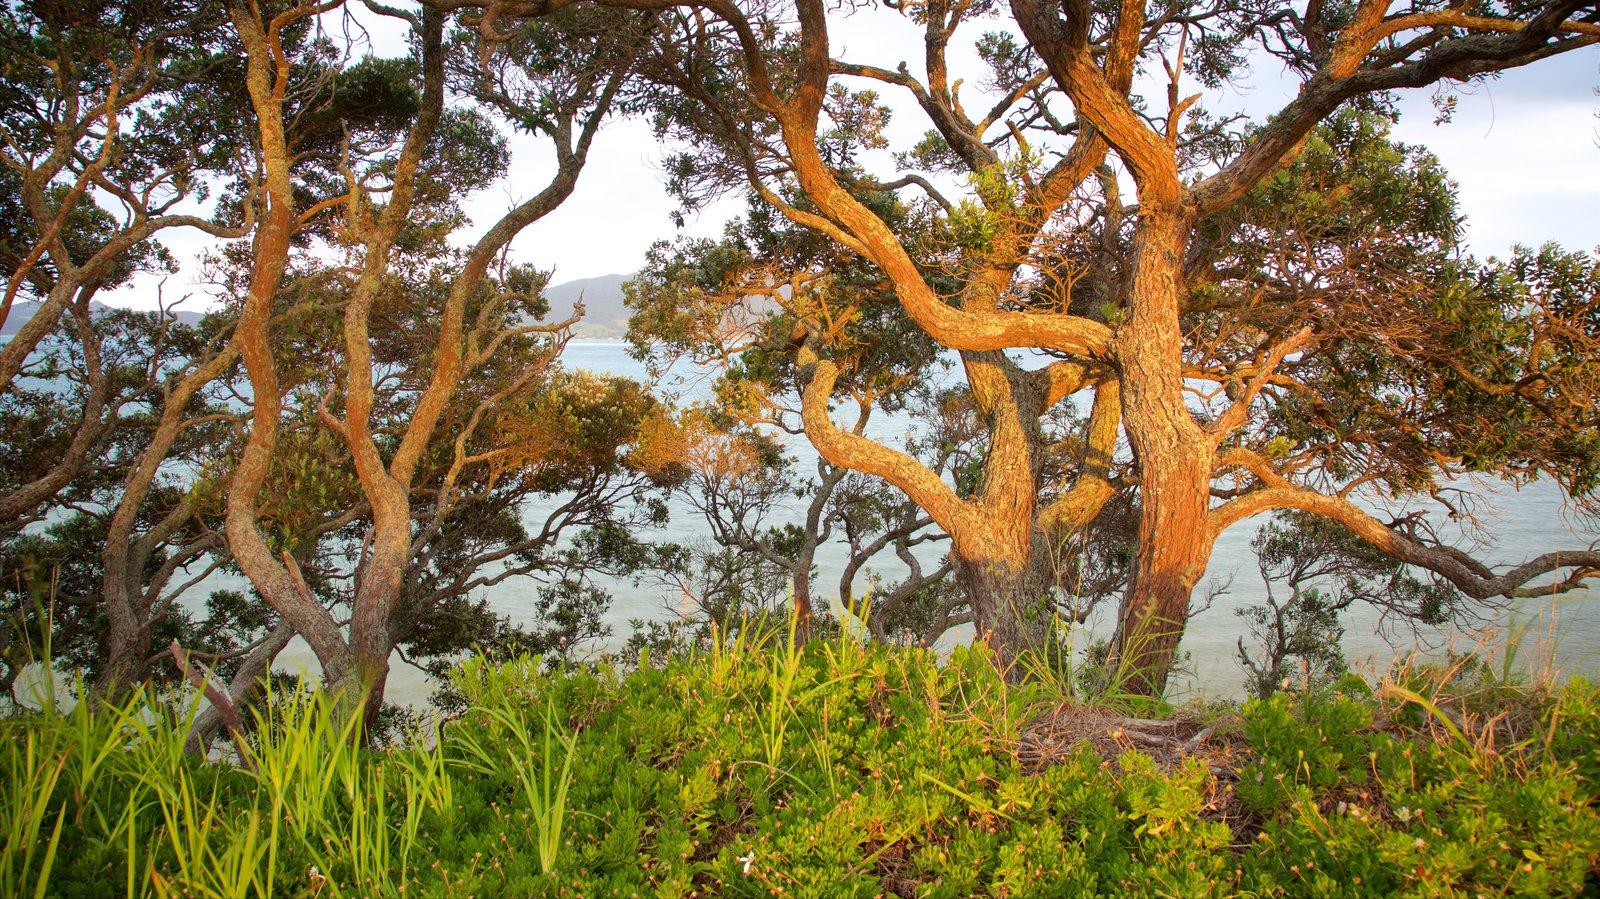 Whangarei Heads featuring a lake or waterhole